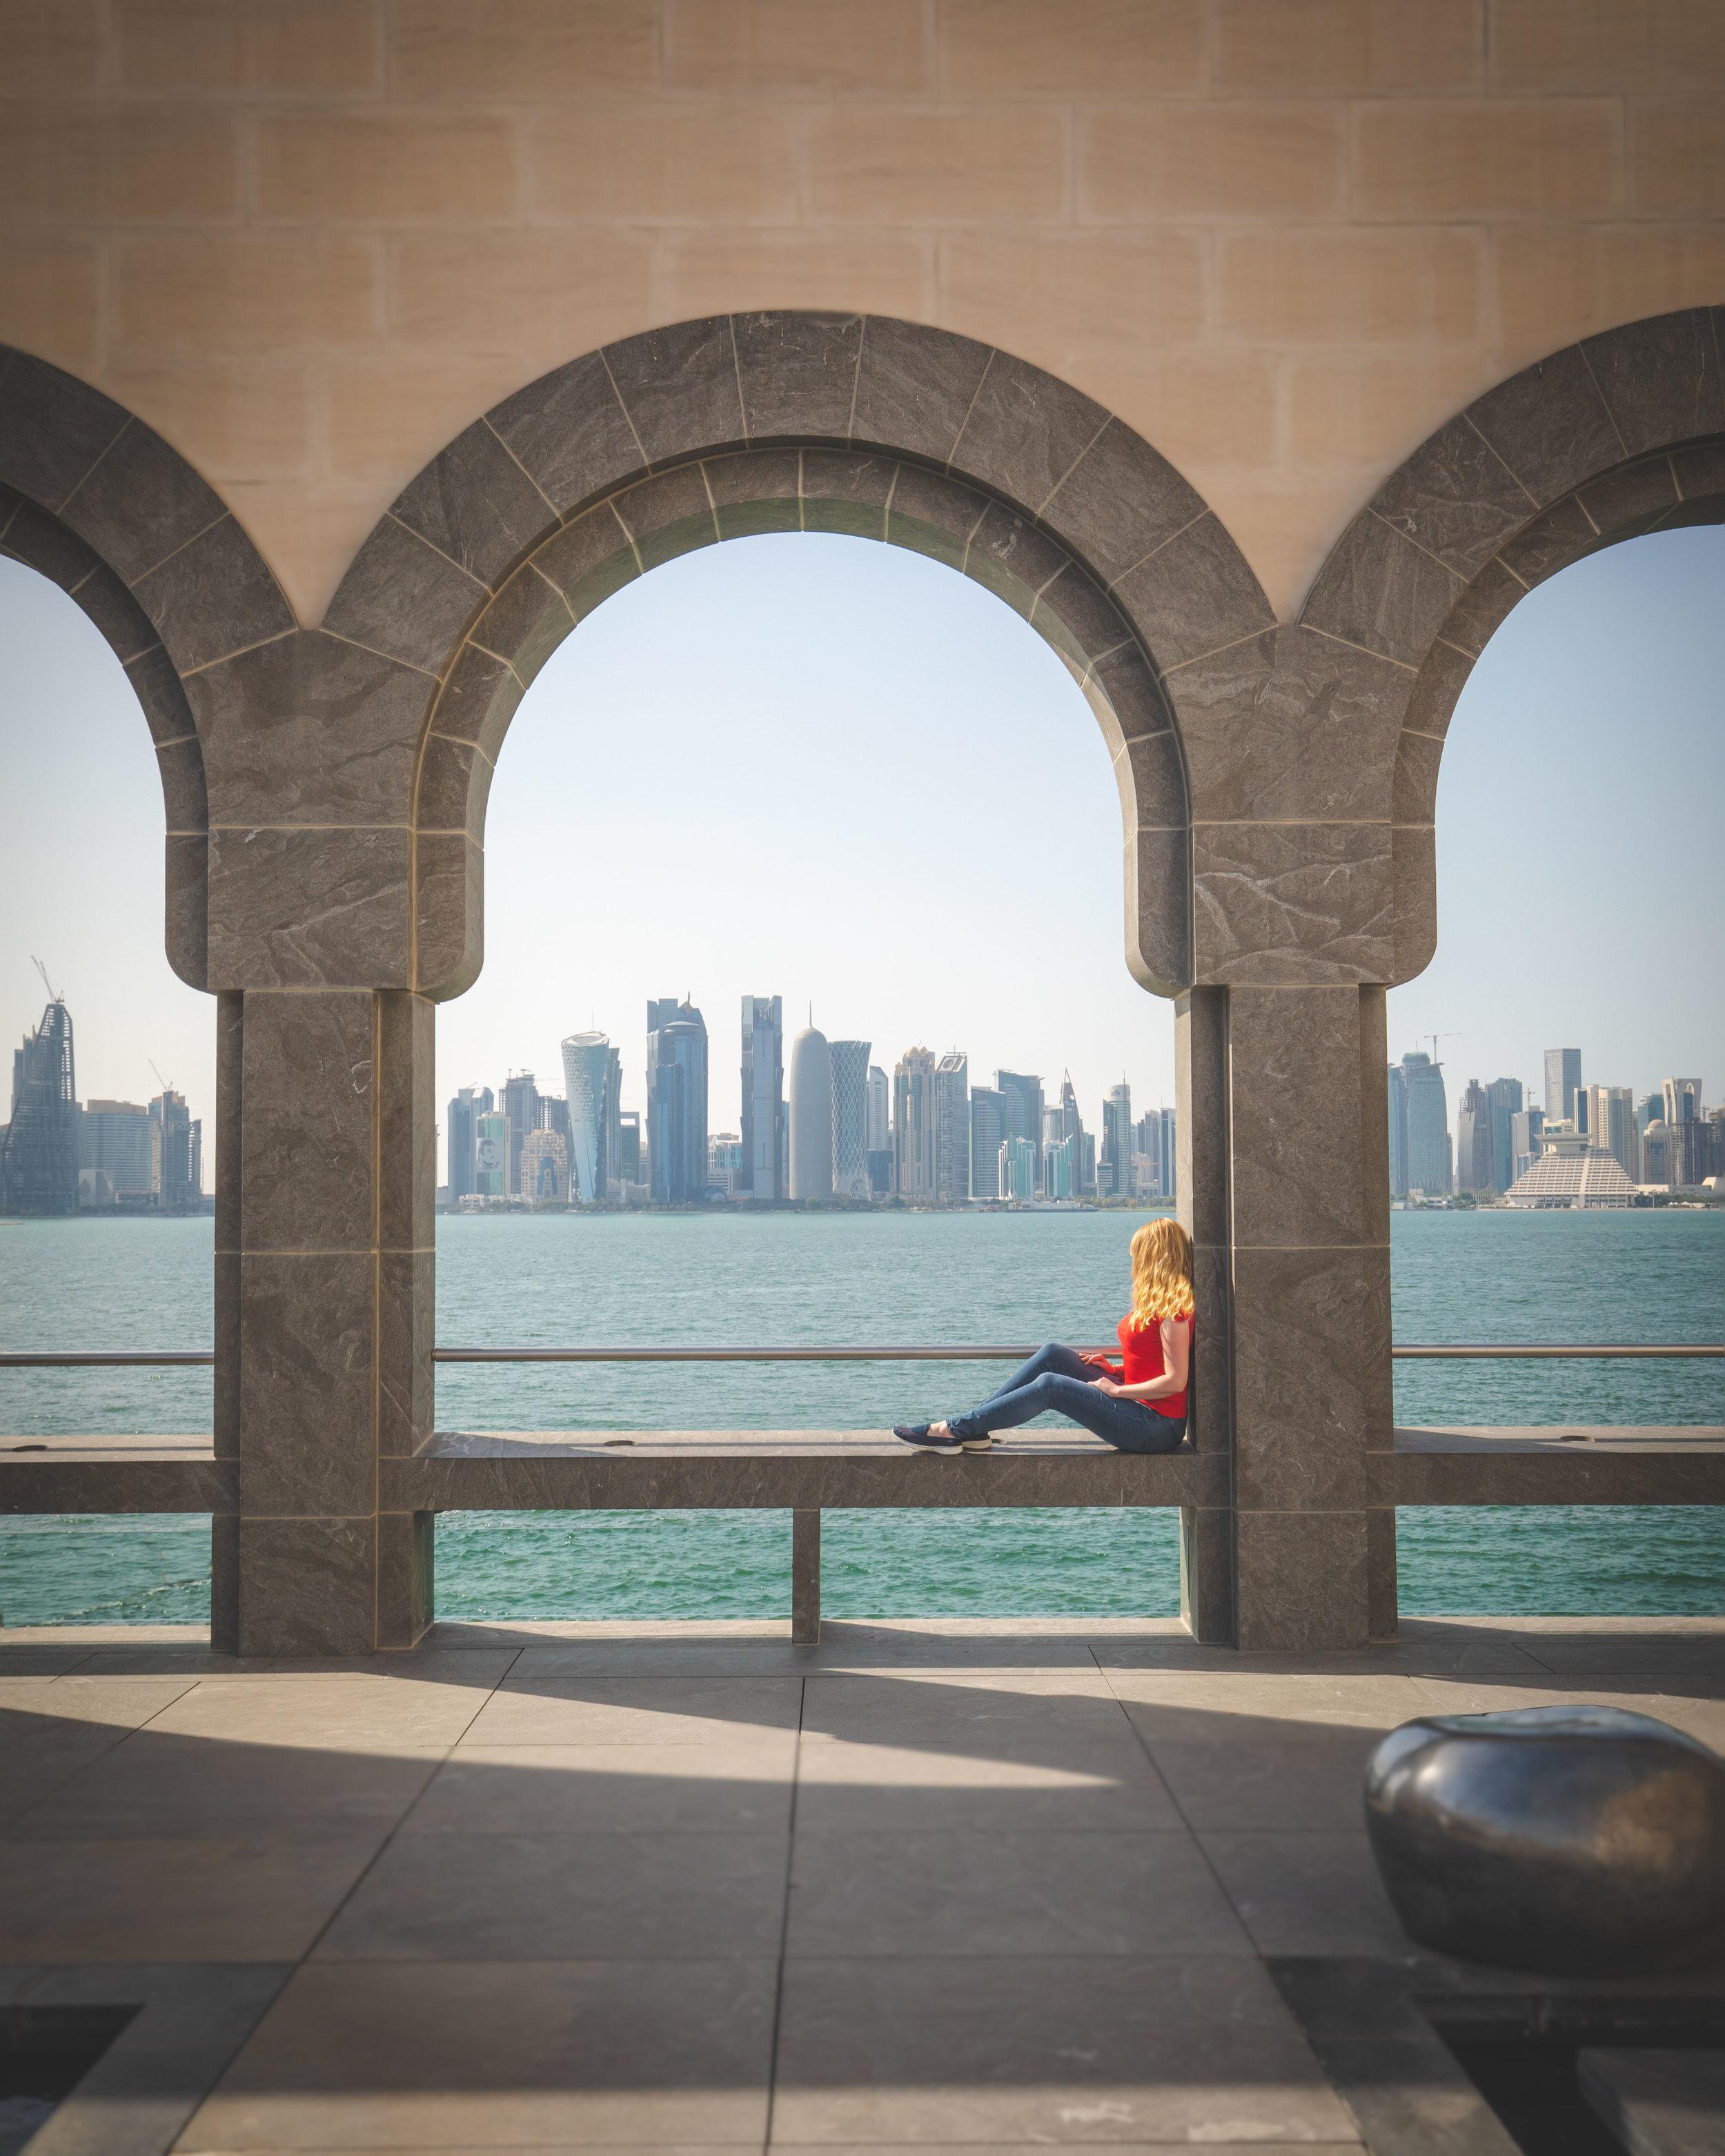 Museum of Islamic Art - 2 day stopover in Doha